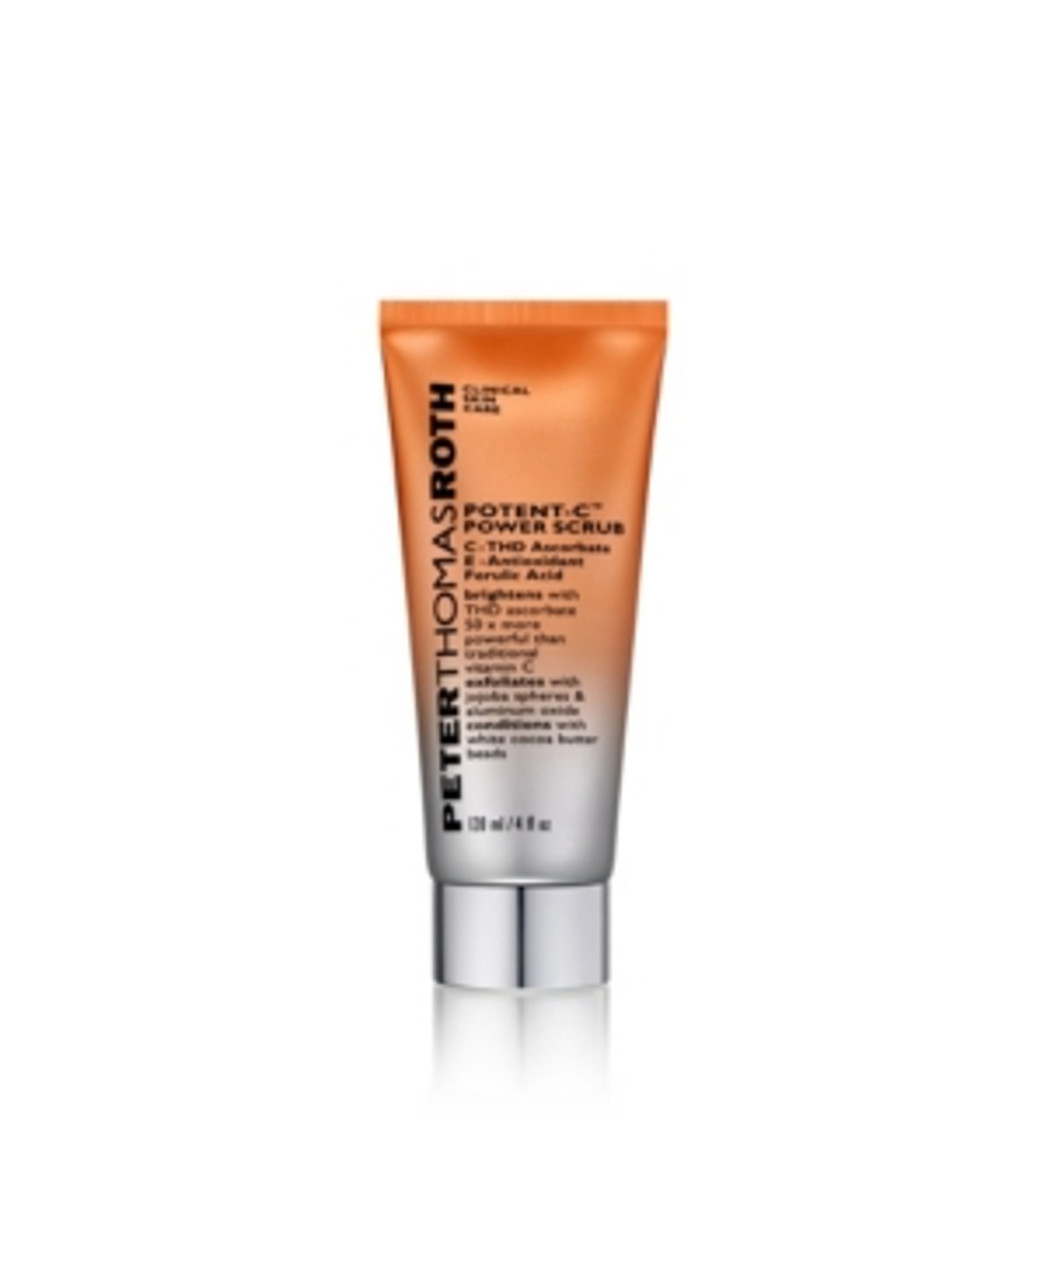 Peter Thomas Roth Potent C Power Scrub, 120 ml Beauty Skin Care - Skin Care - Skin Care Categories.